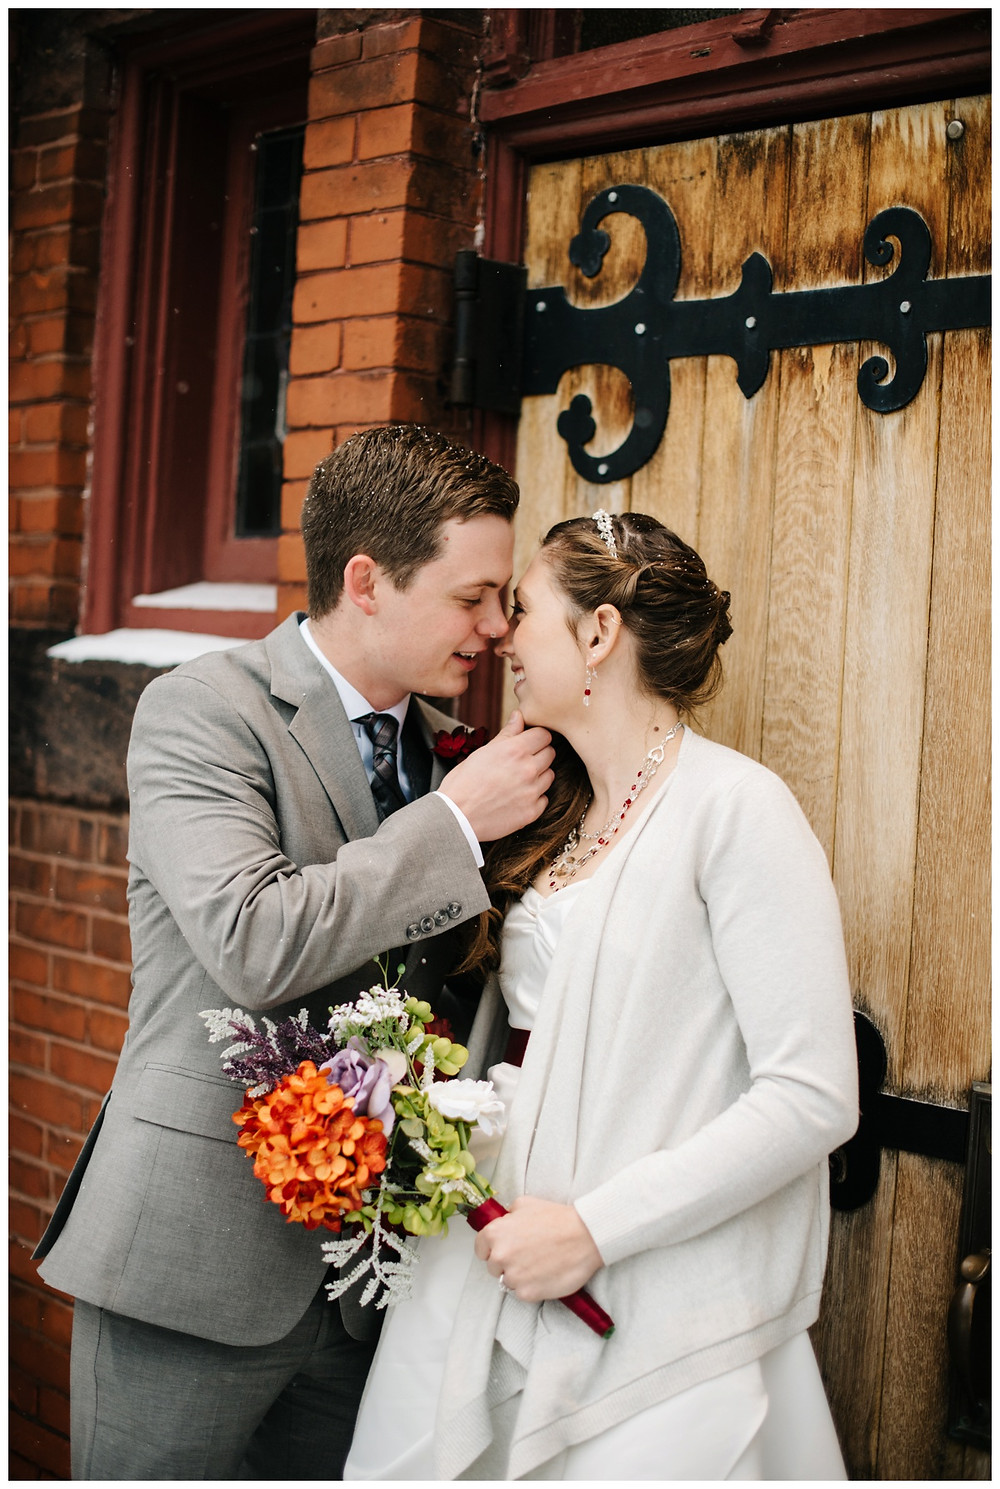 wedding-couple-near-kiss-at-milwaukee-wedding-by-milwaukee-wedding-photographer-kyra-rane-photographer